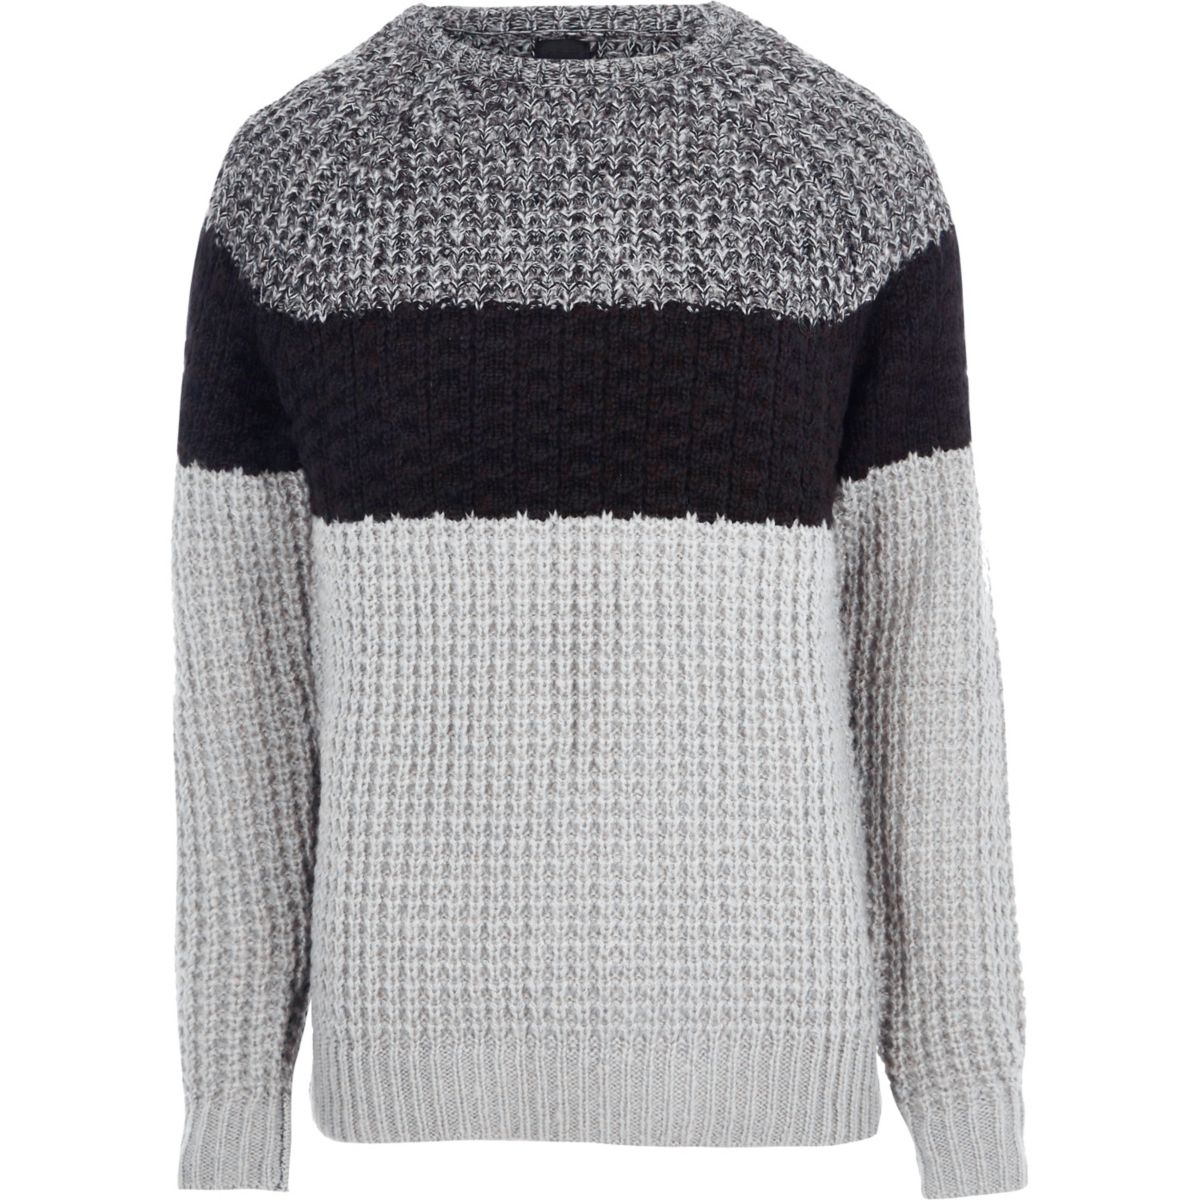 Grey blocked fisherman sweater